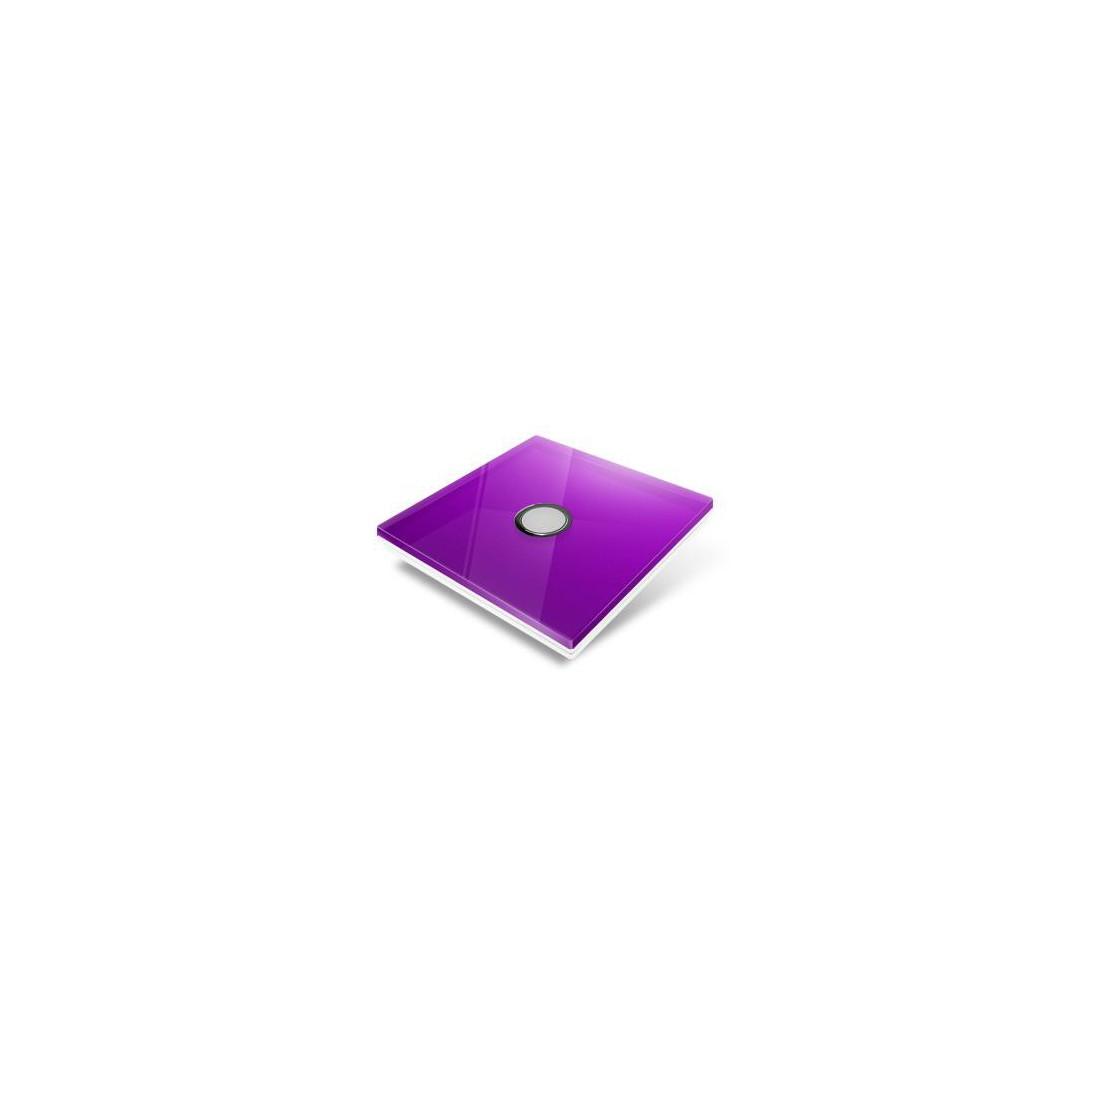 Tampa de cobertura para interruptor Edisio - cristal púrpura